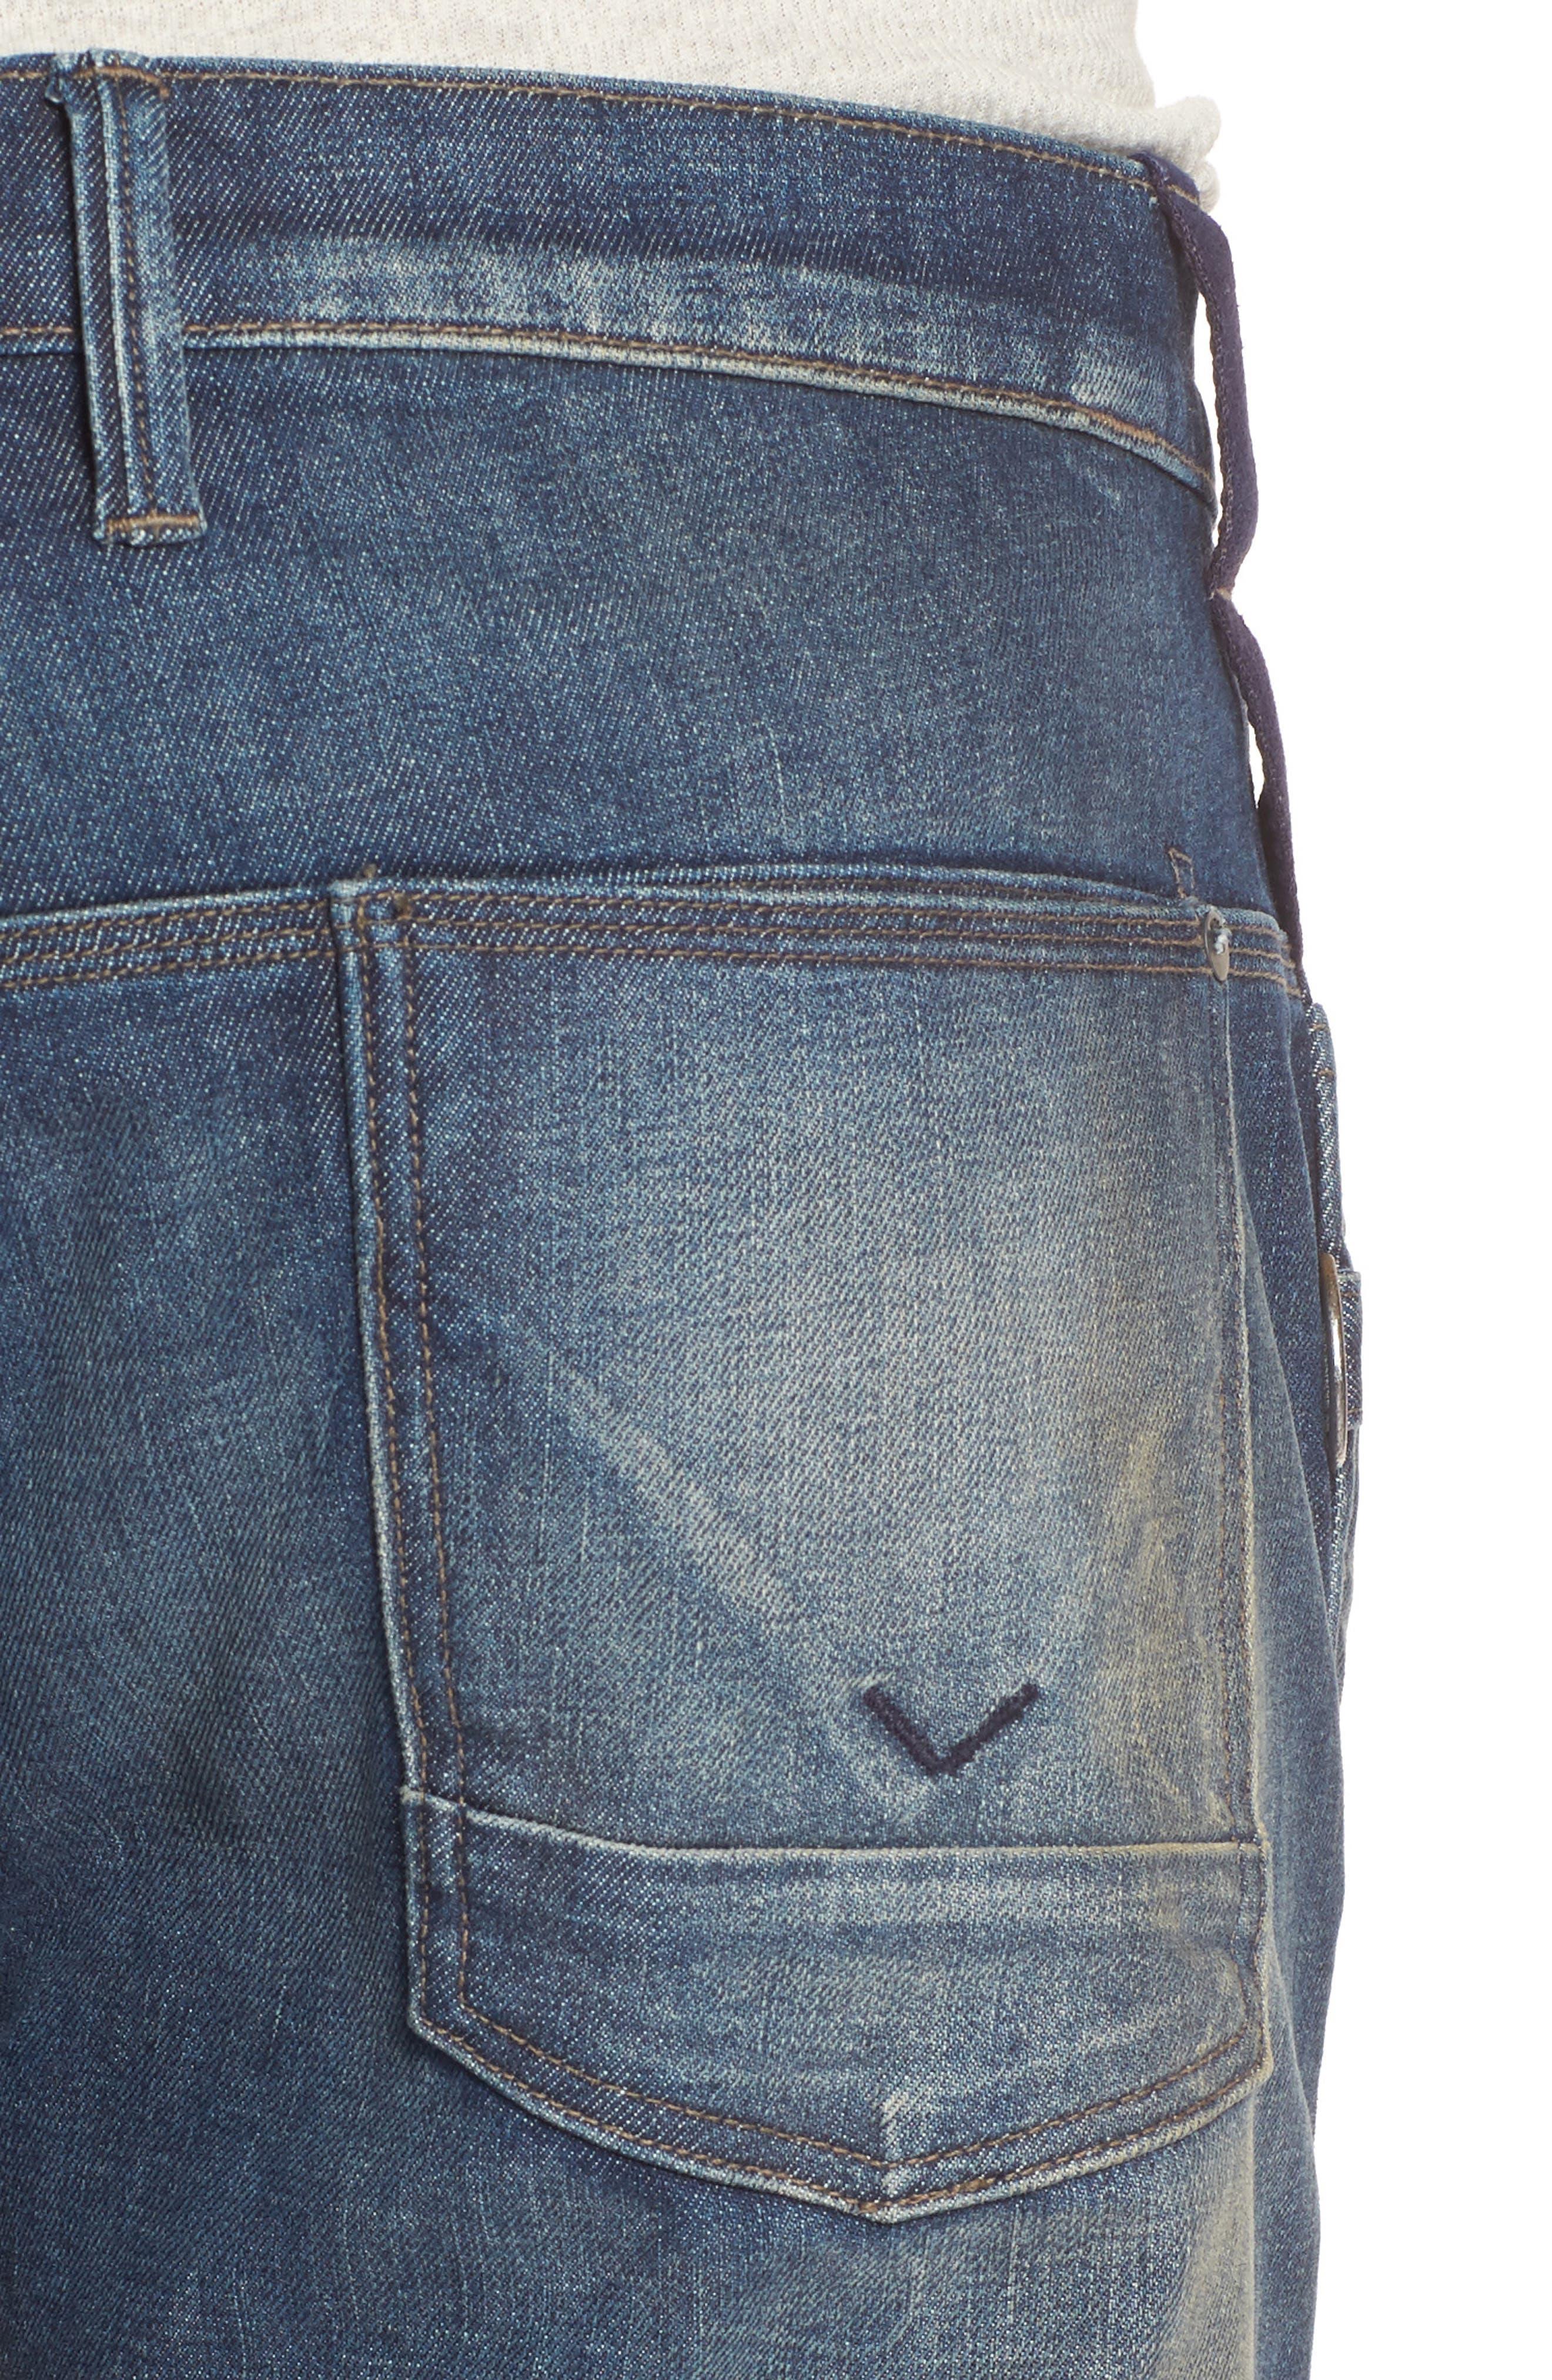 Hunter Straight Fit Jeans,                             Alternate thumbnail 4, color,                             Virus